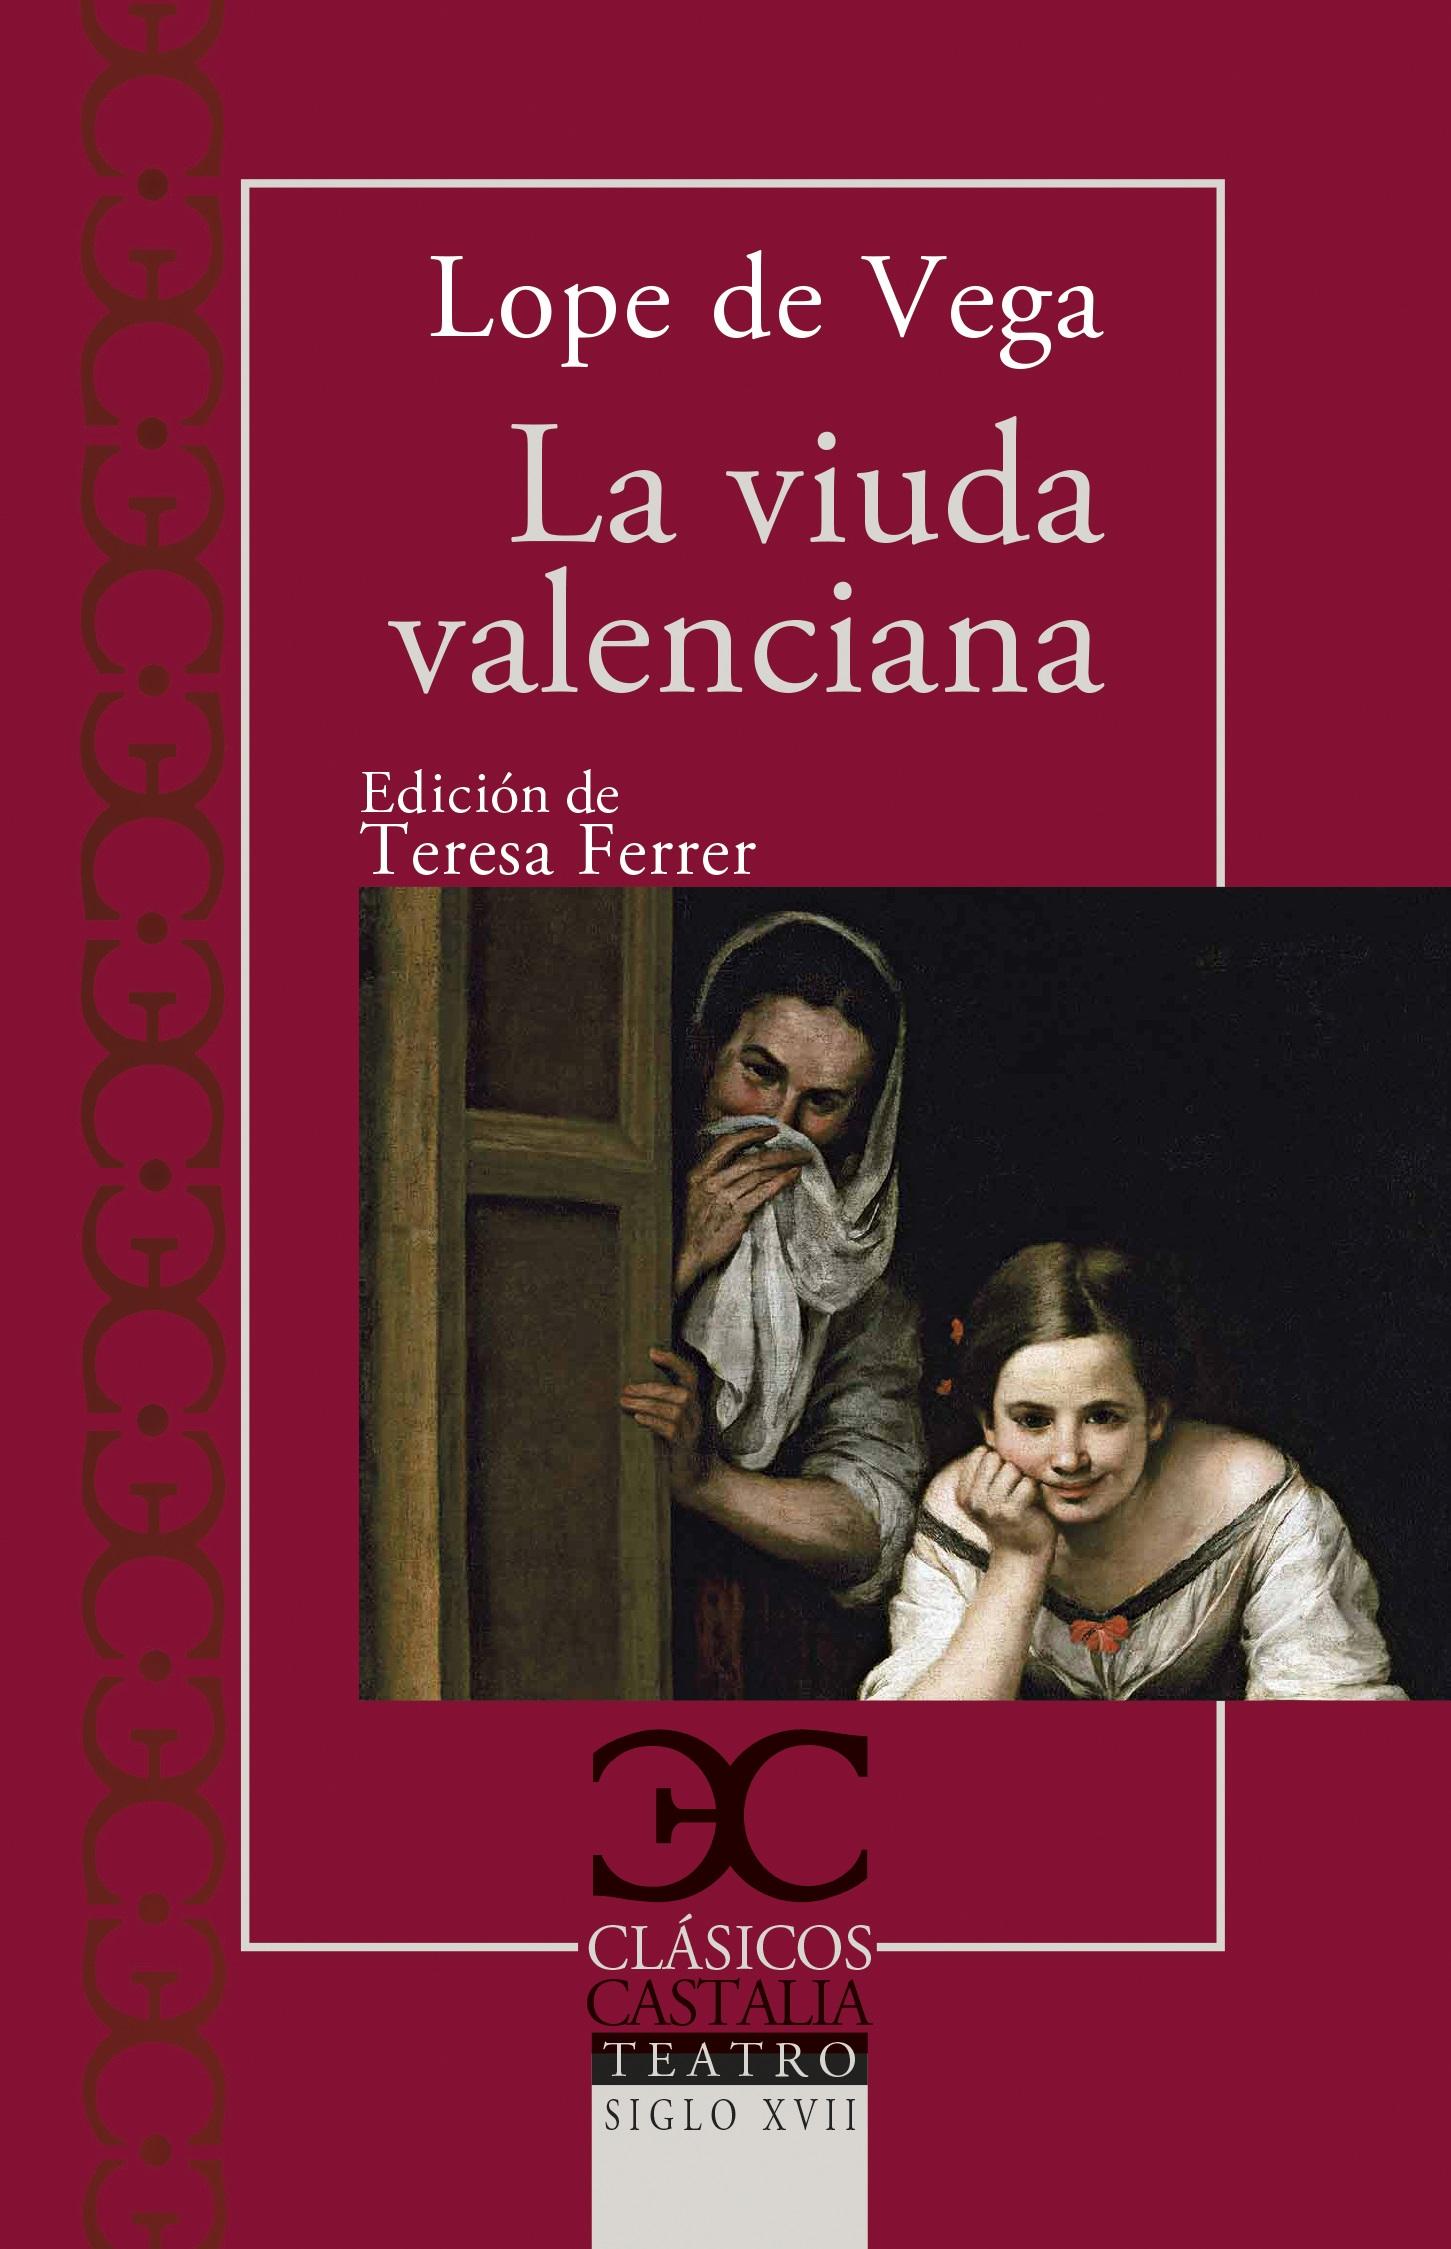 La viuda valenciana